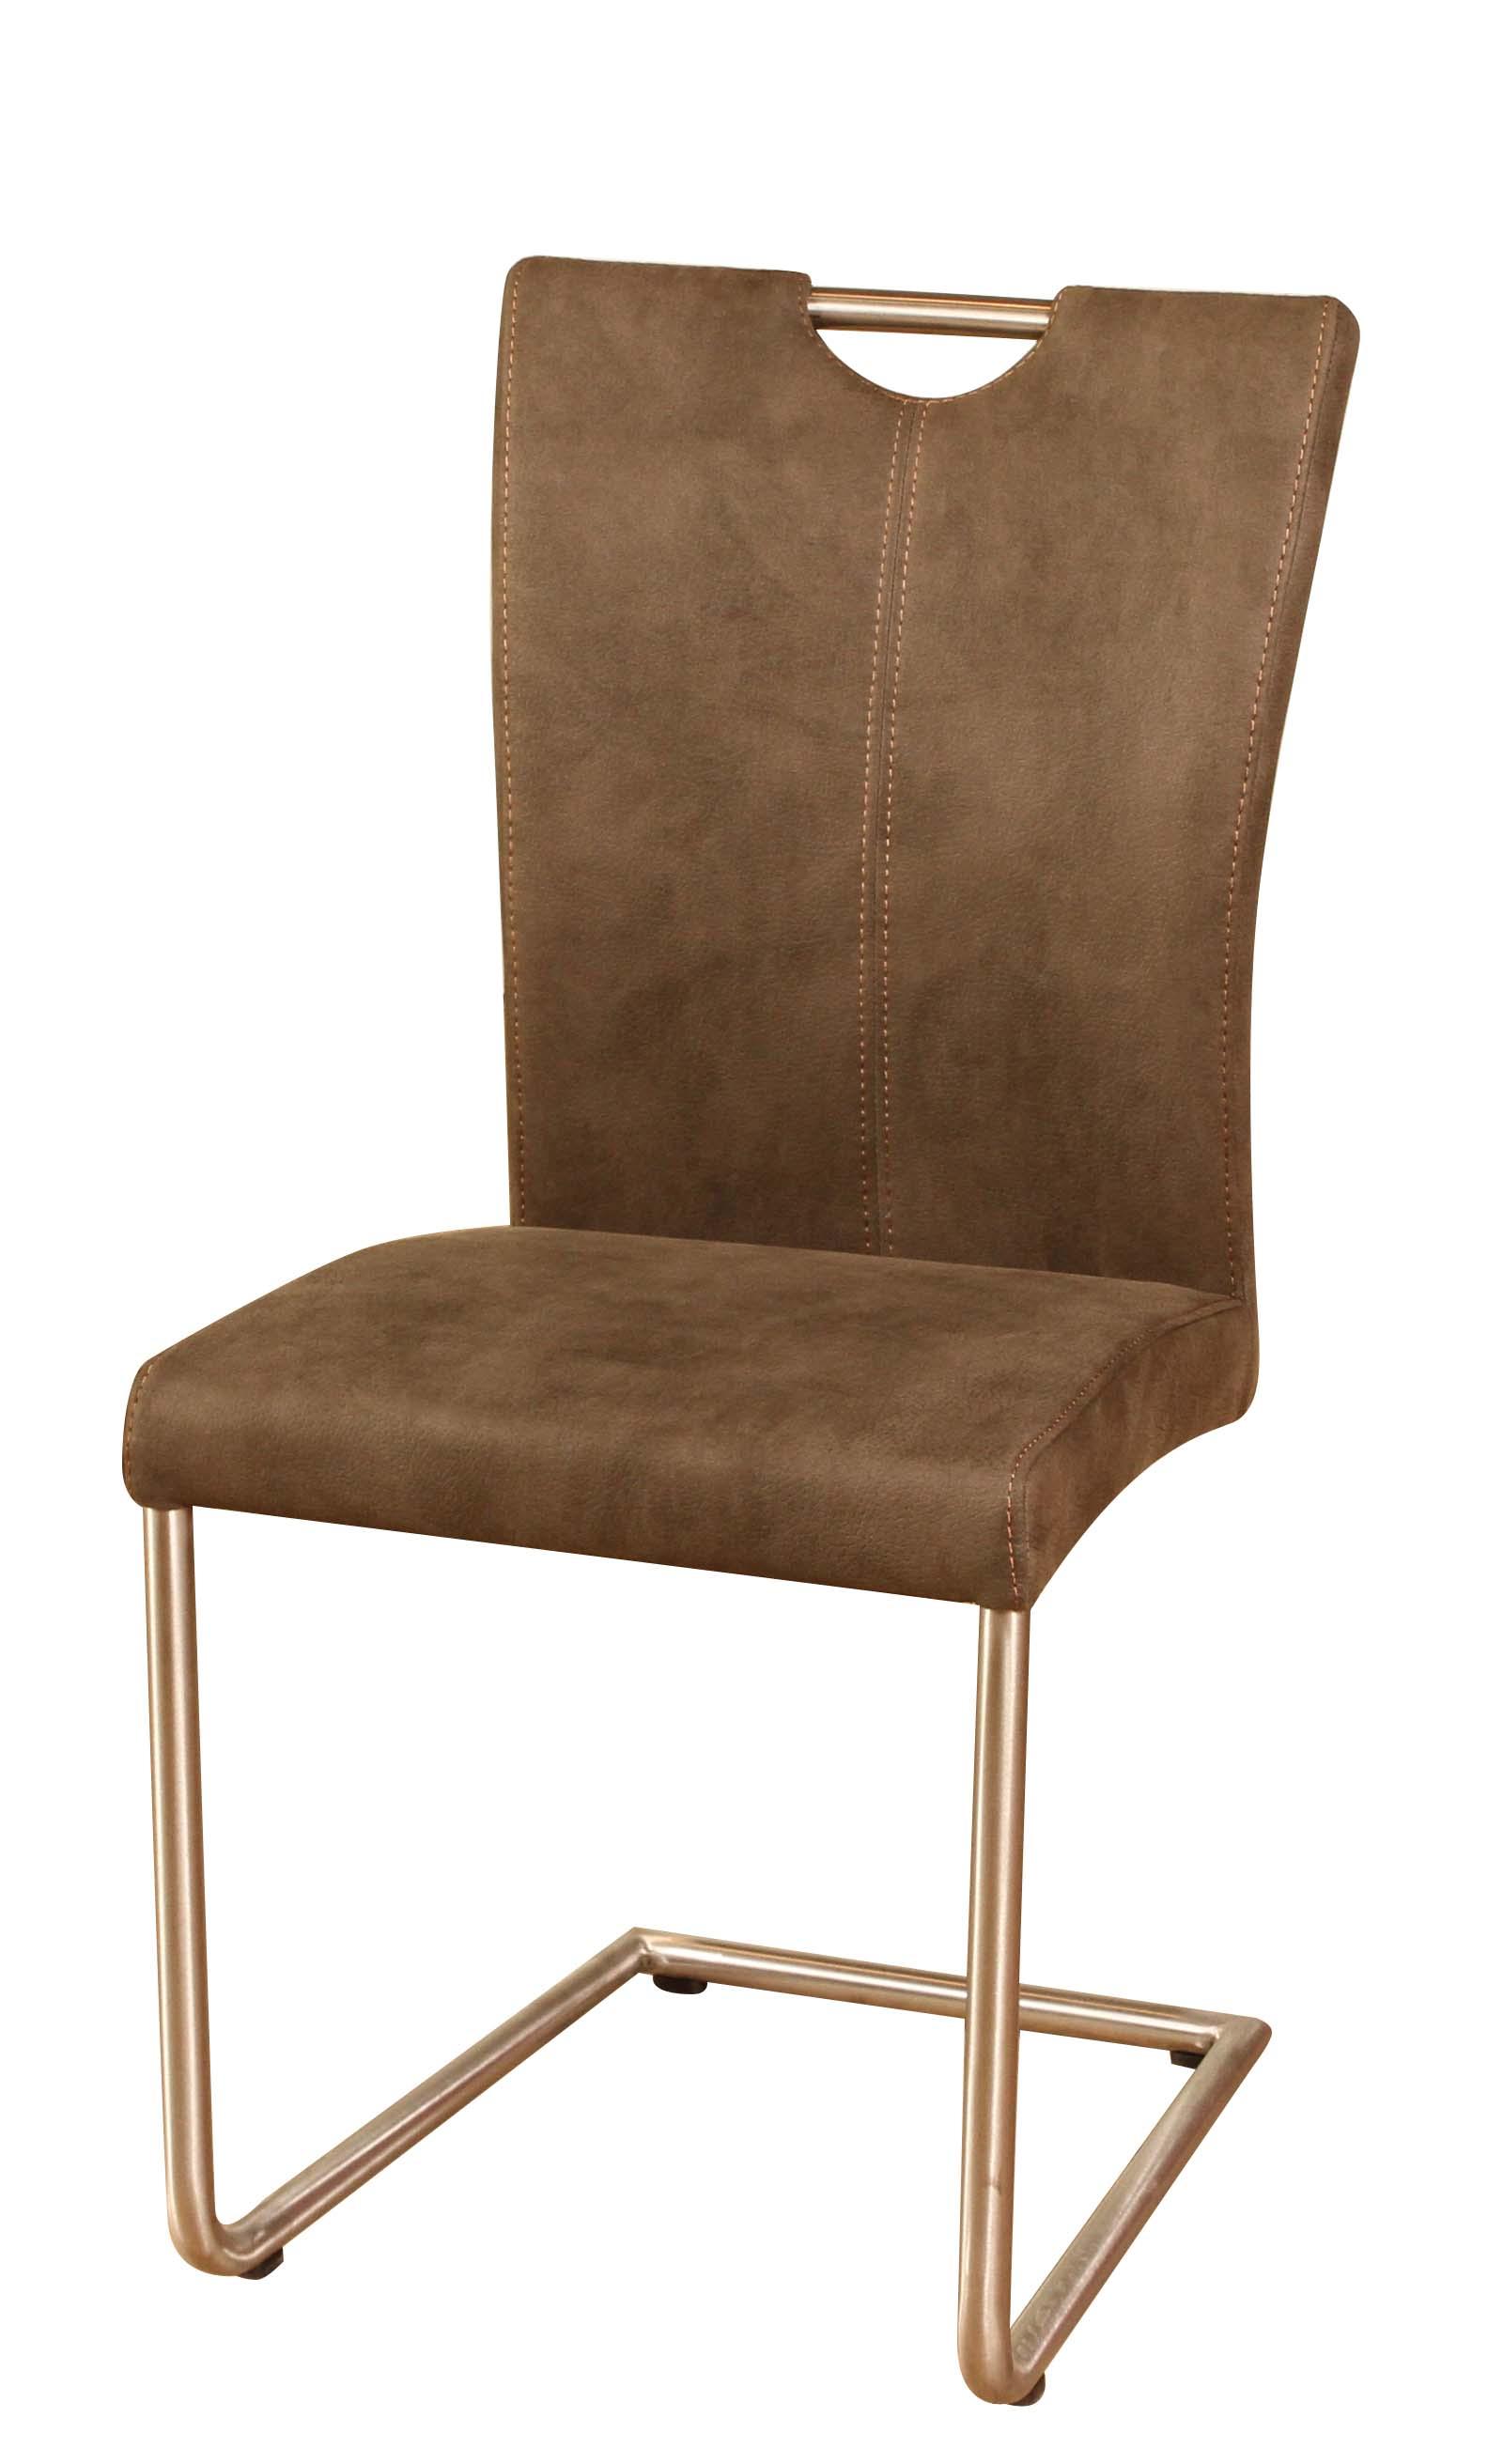 sam esszimmer schwing stuhl elephant muddy heike. Black Bedroom Furniture Sets. Home Design Ideas